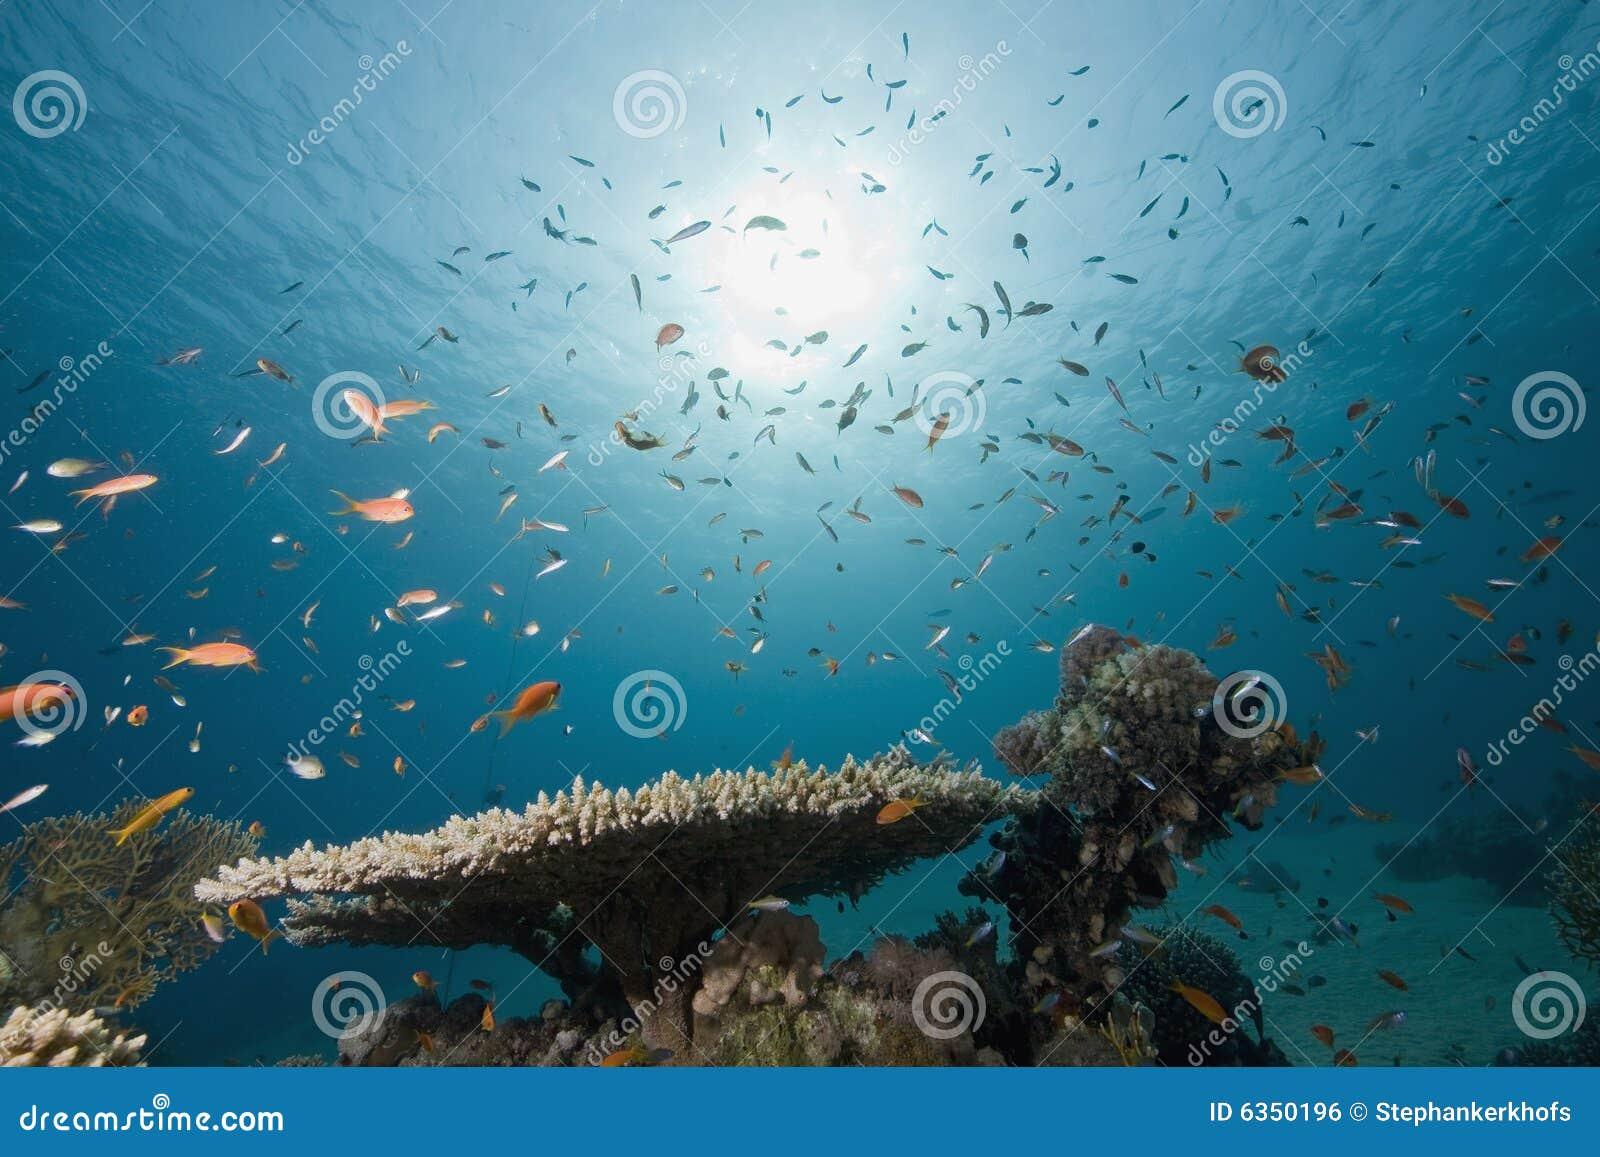 corail et poissons photo stock image du poissons blanc 6350196. Black Bedroom Furniture Sets. Home Design Ideas